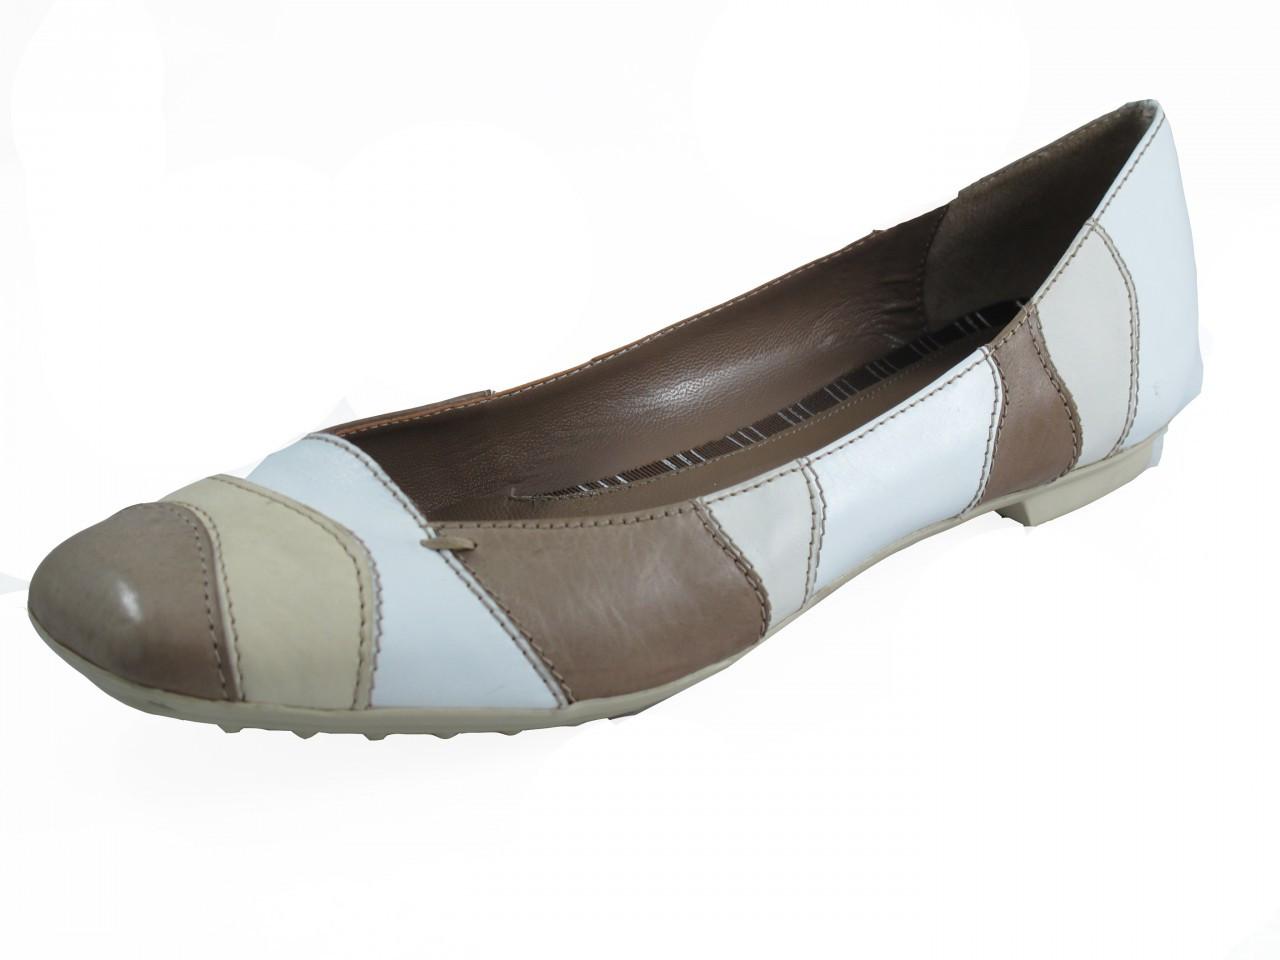 Bala Shoes Stores